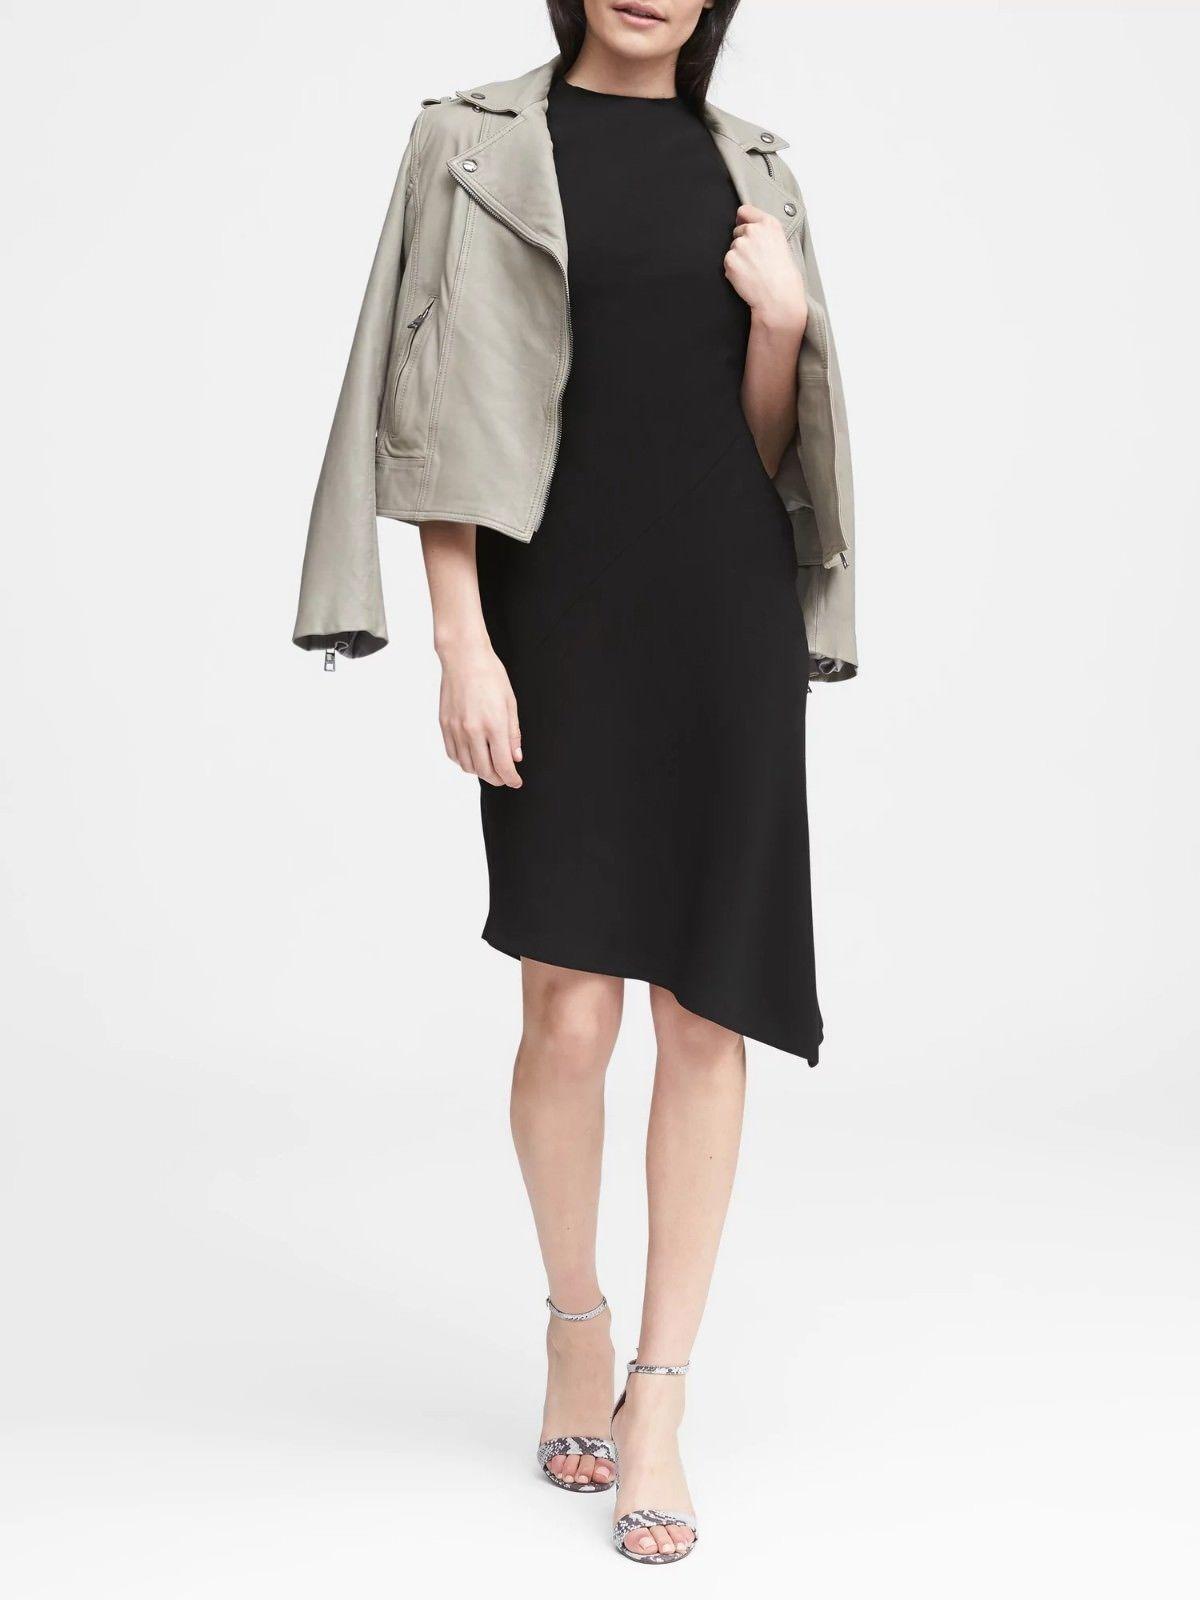 Banana Republic Mock-Neck Sheath Dress, schwarz, Größe 14P(Petite), NWT,Retail